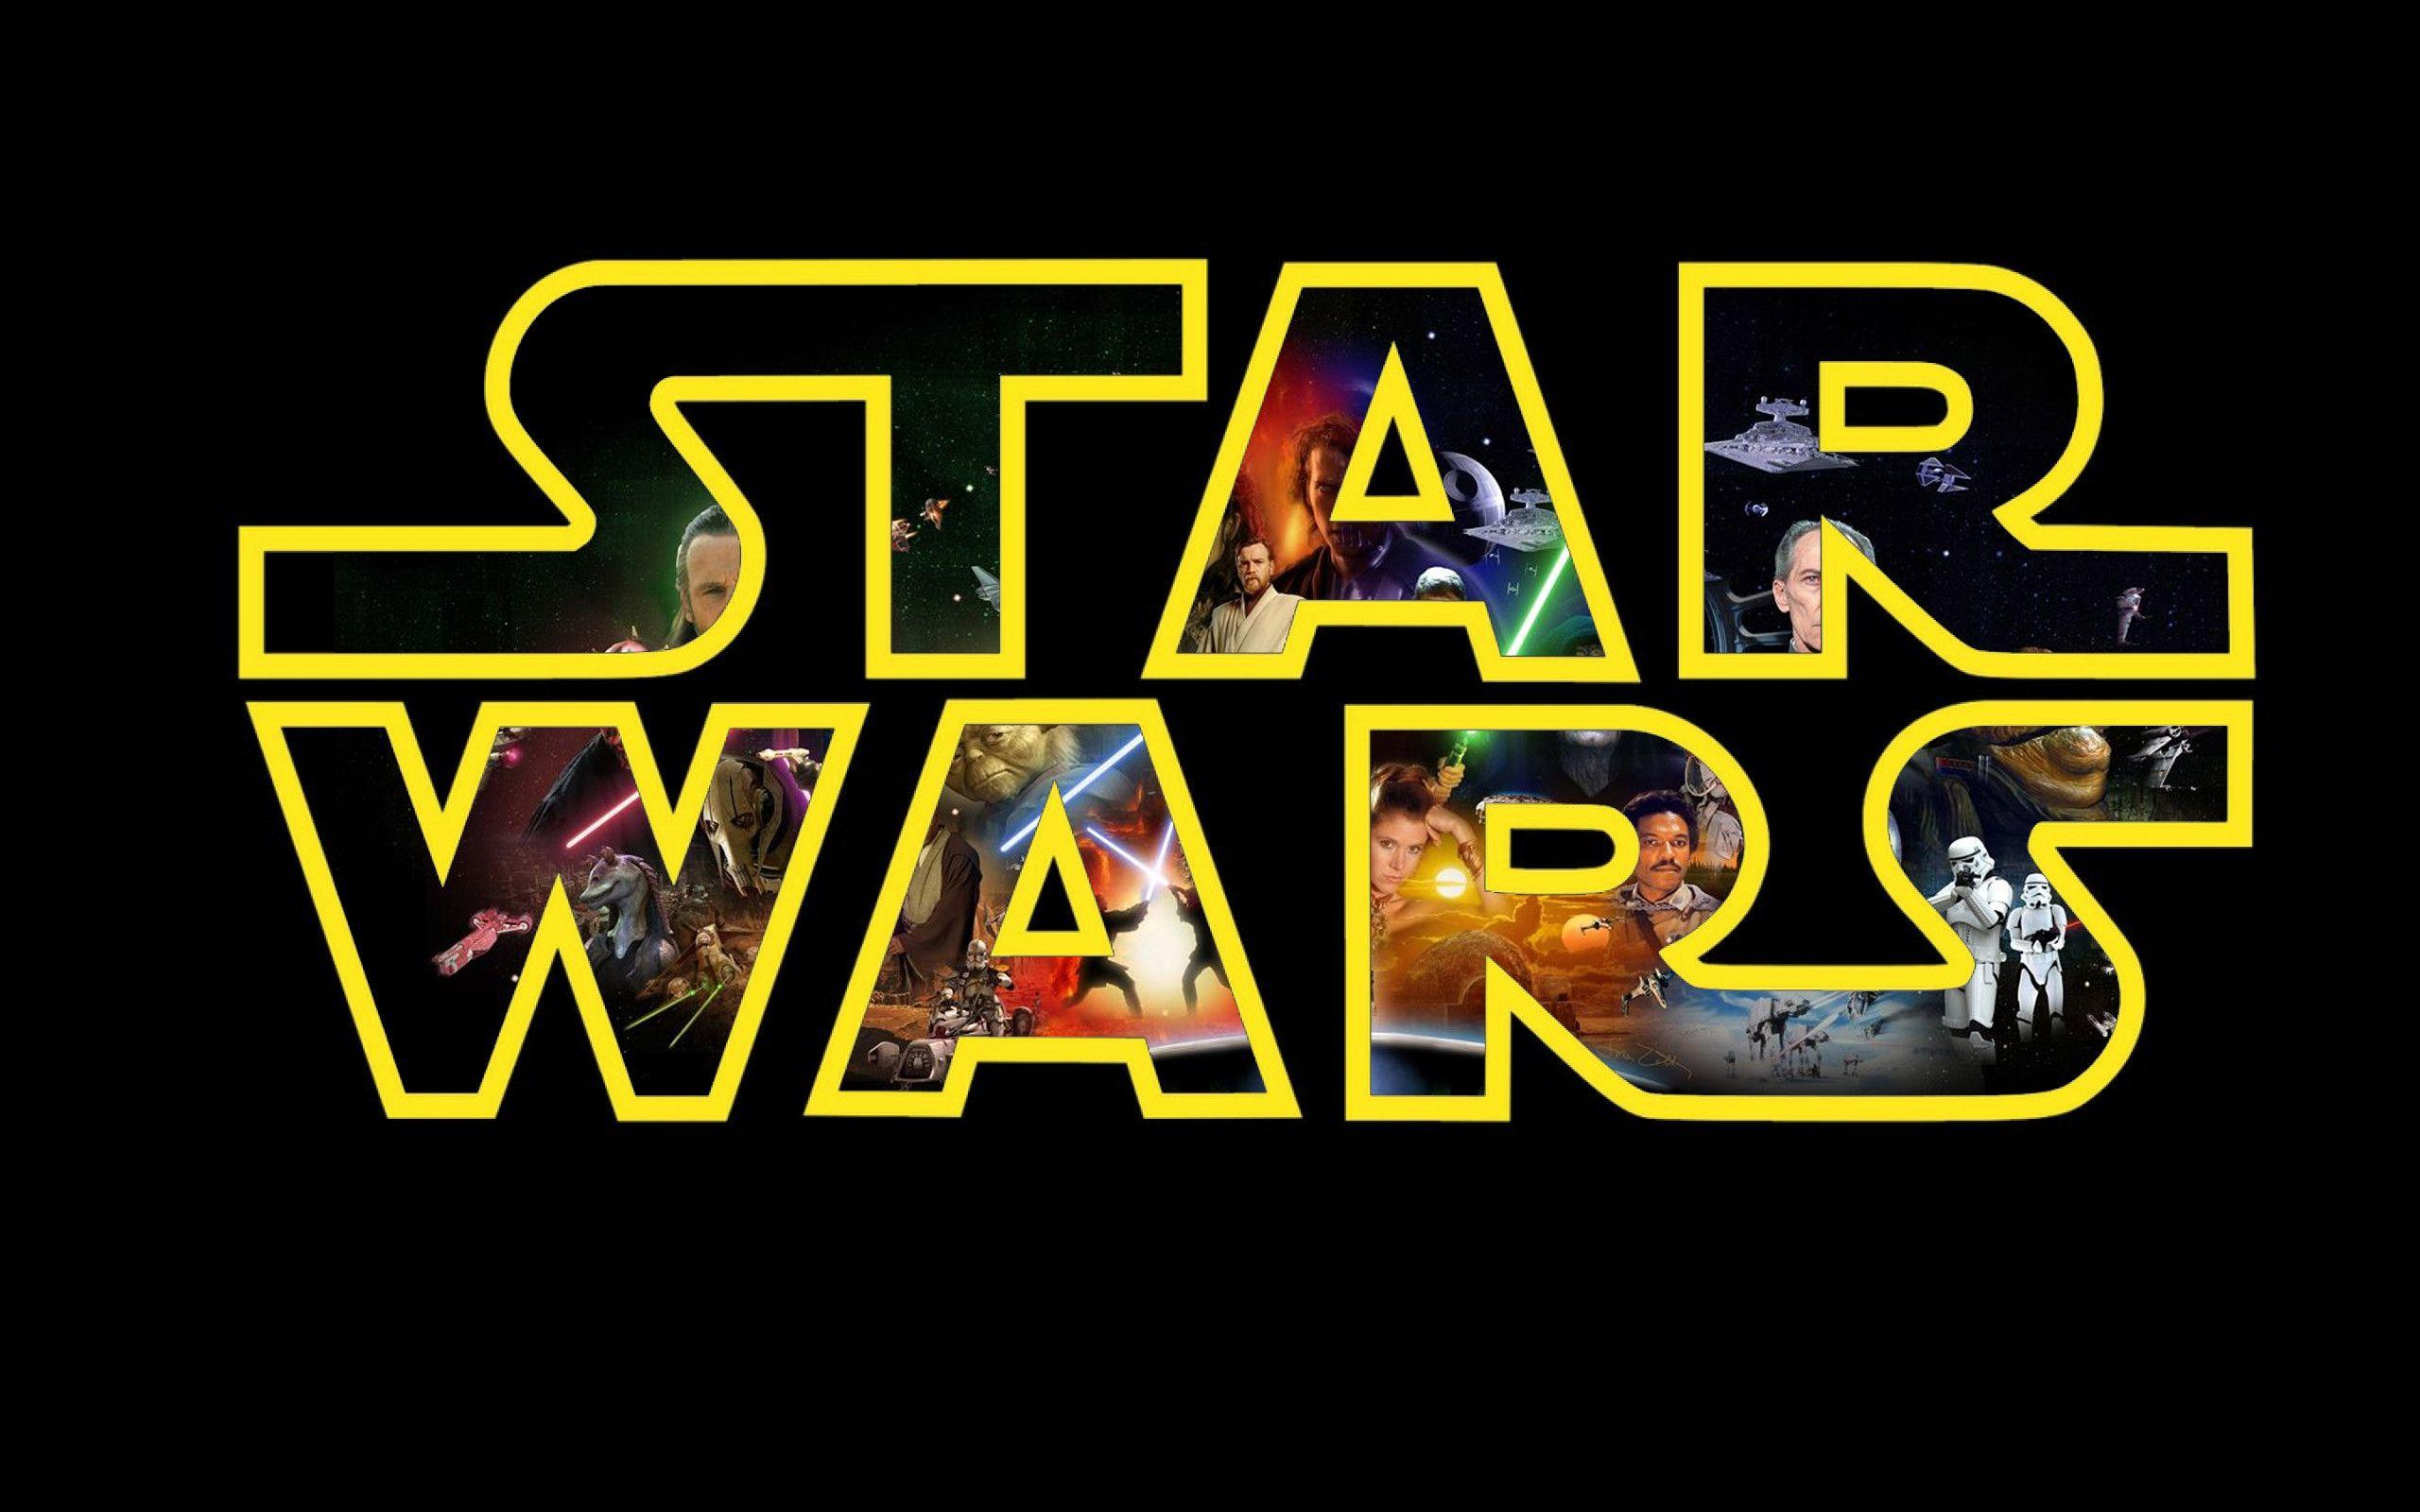 Star Wars Desktop Wallpapers Moving ...